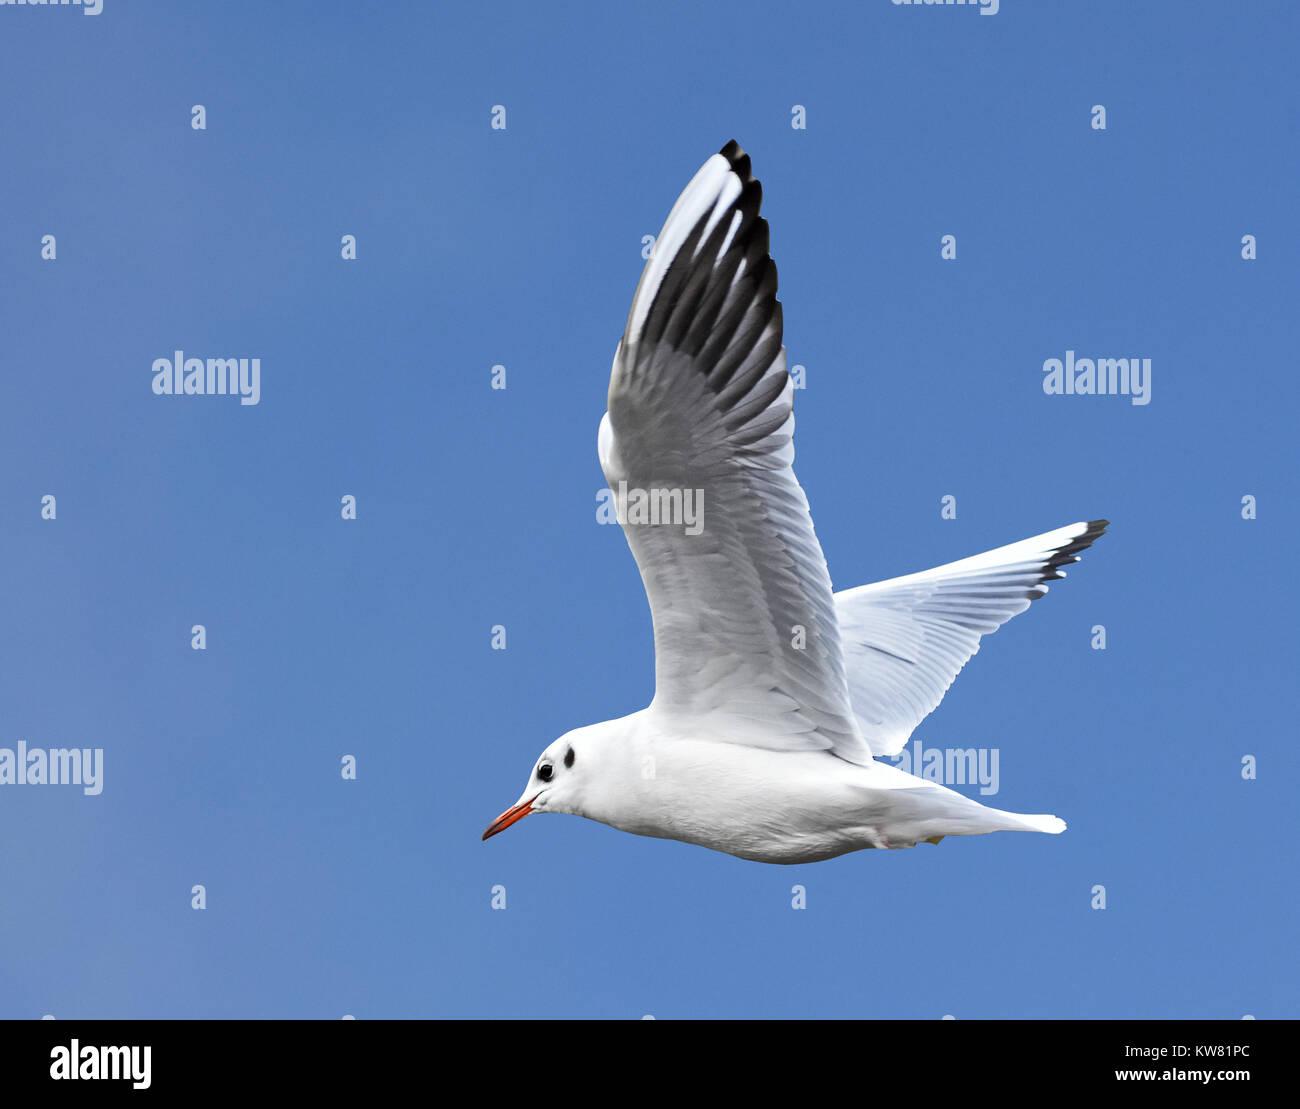 Black-headed Gull Larus ridibundus in flight in winter plumage agains a clear blue sky - Stock Image